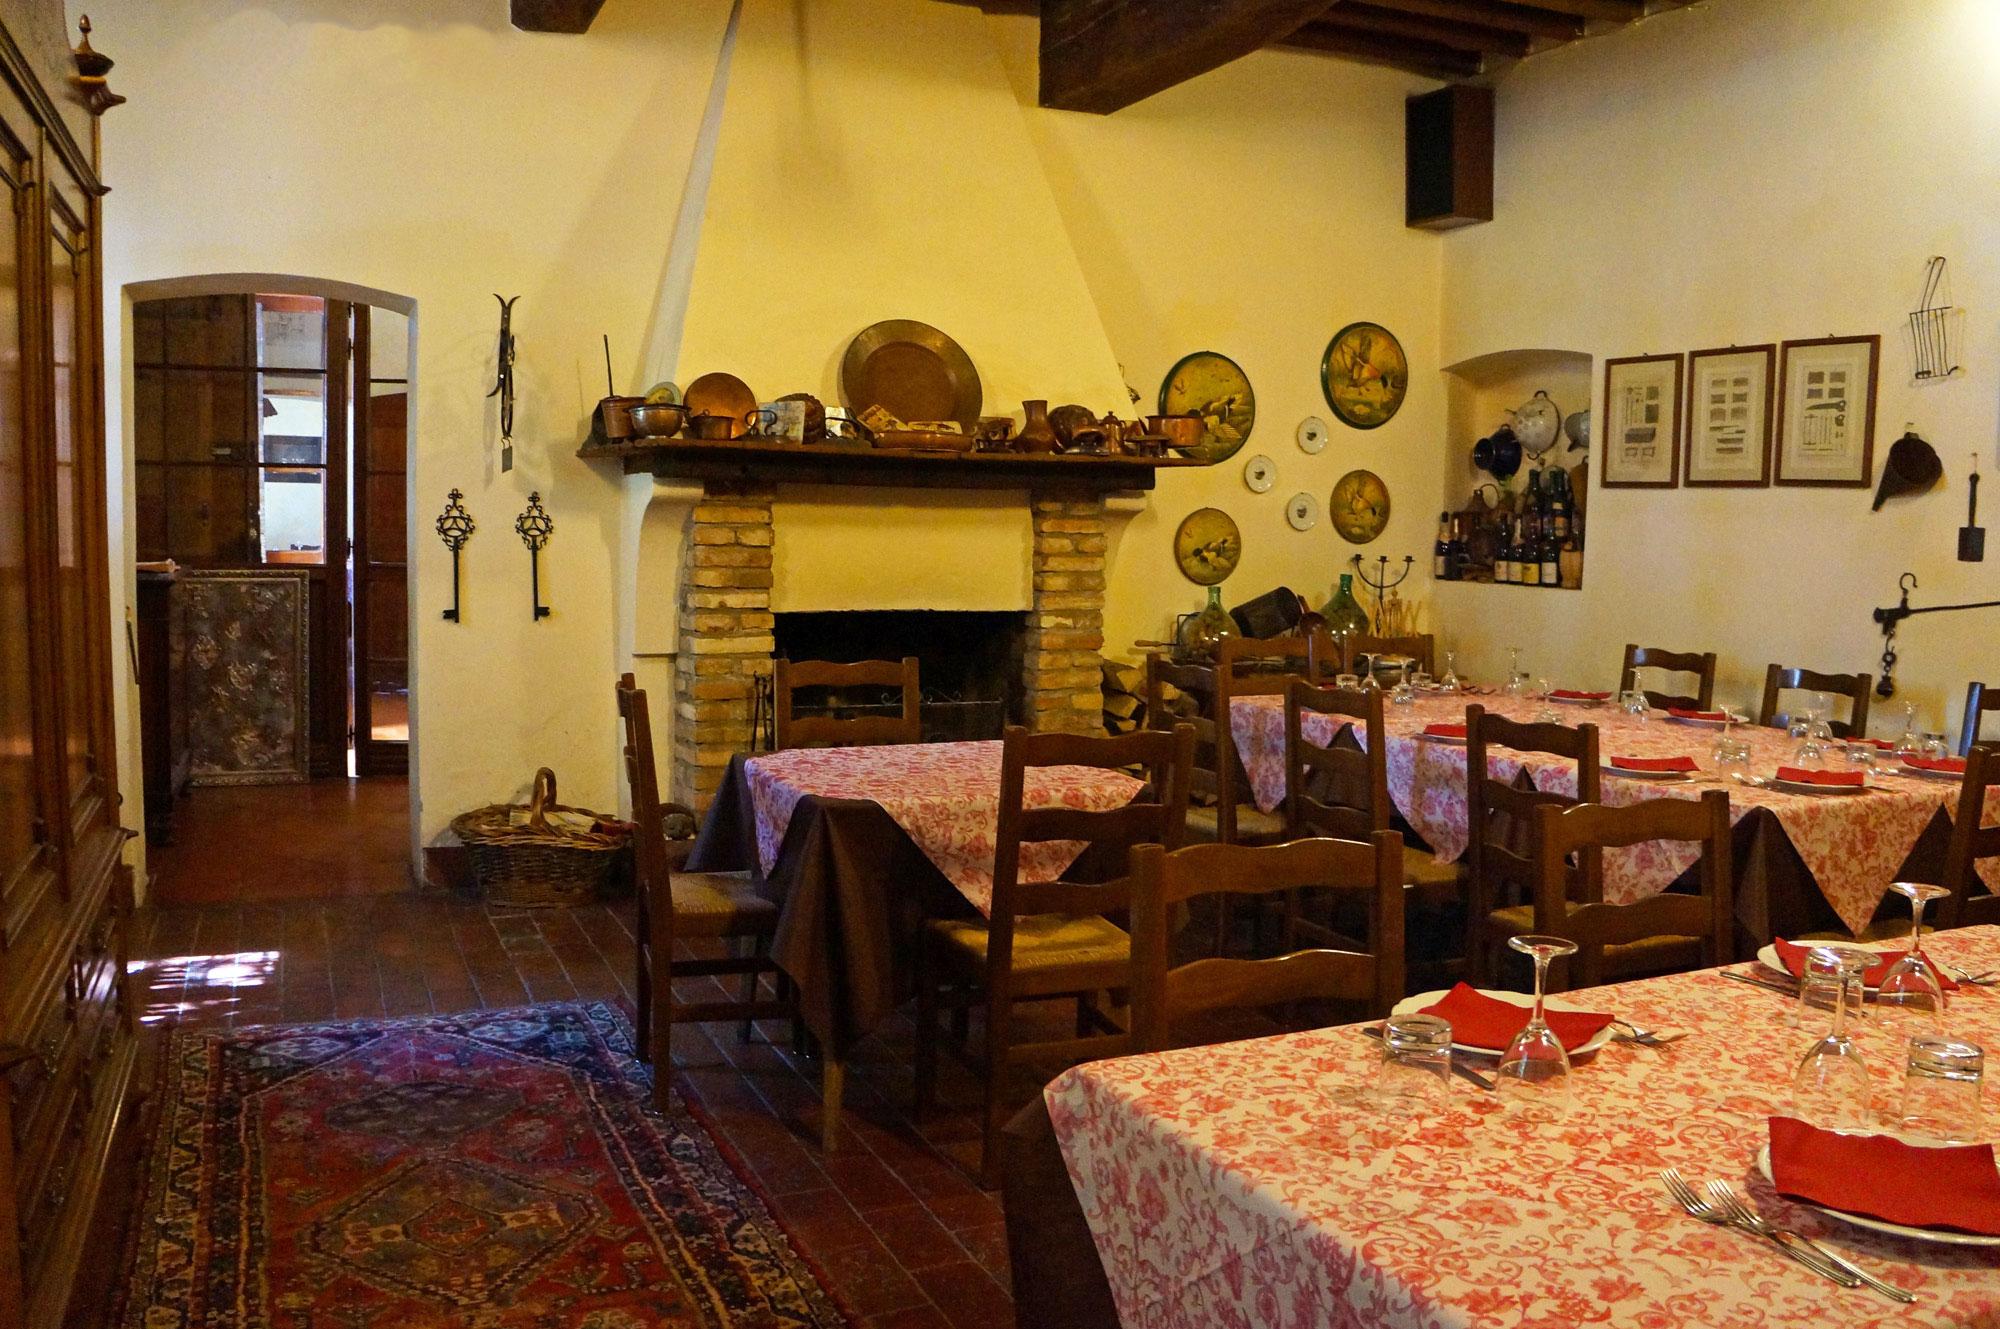 Corte bondeno dove mangiare a mantova travel on art - La cucina mantova ...